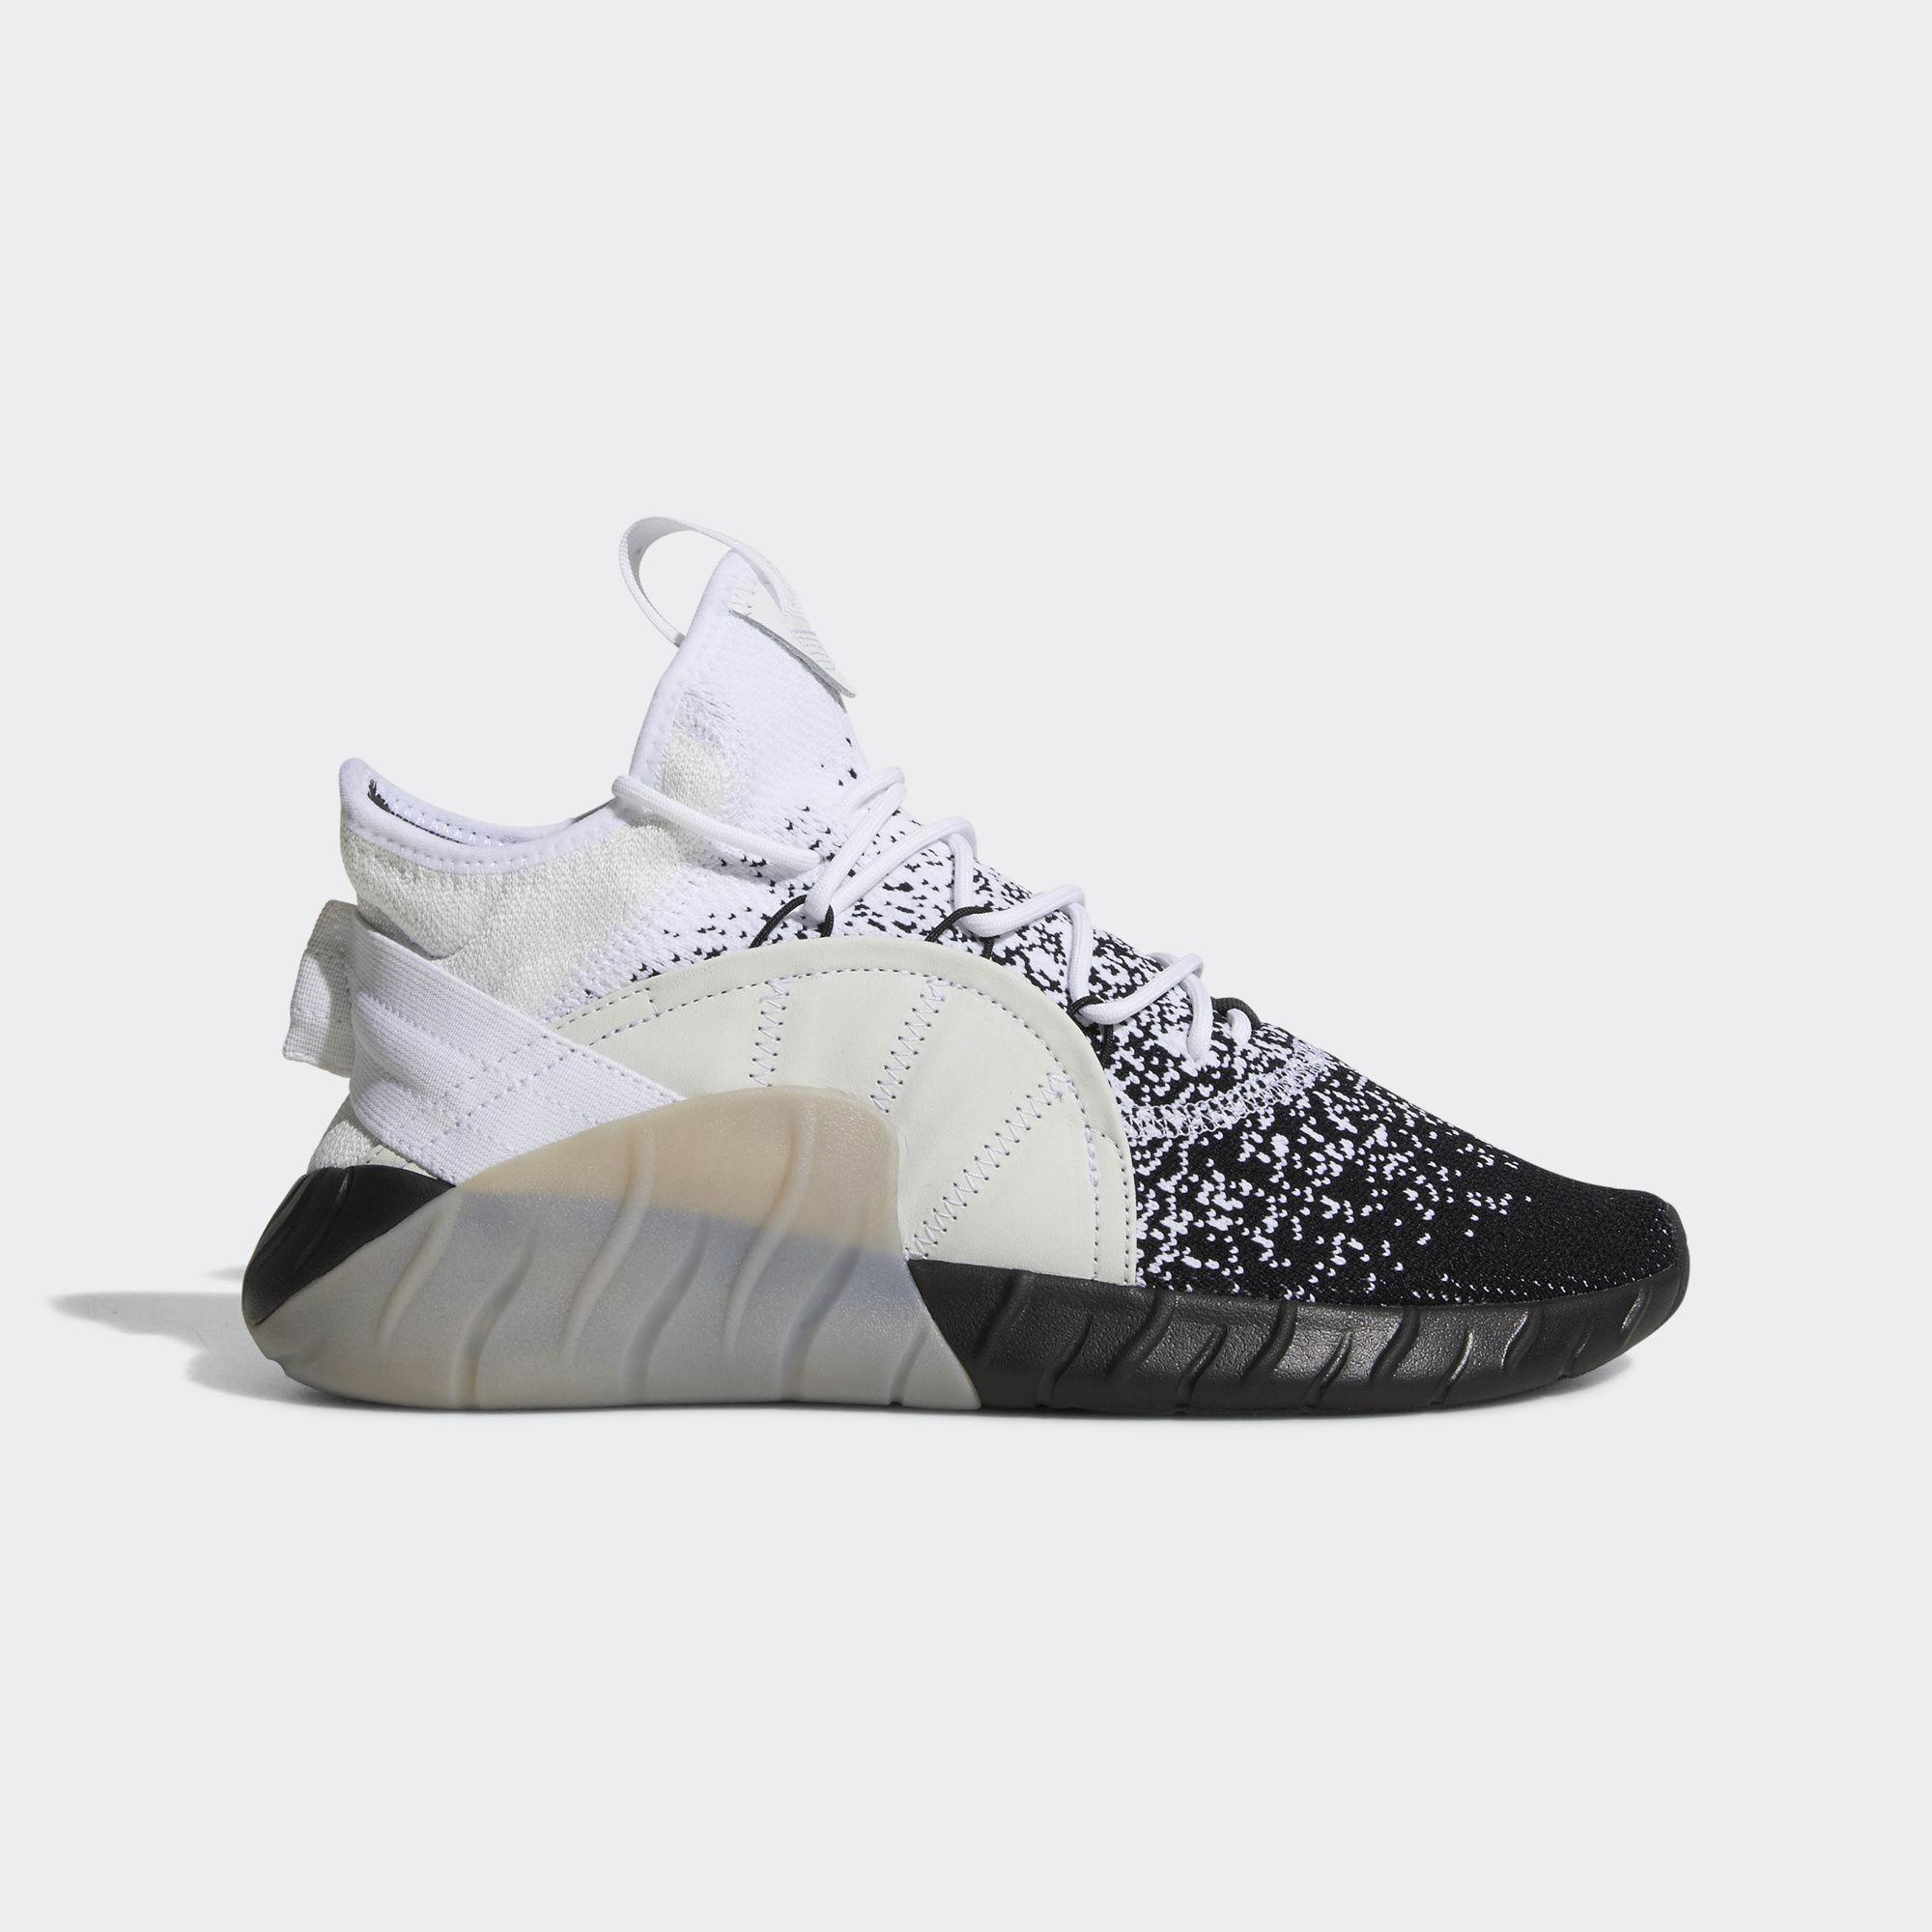 Adidas. Men's White Tubular Rise Primeknit Shoes